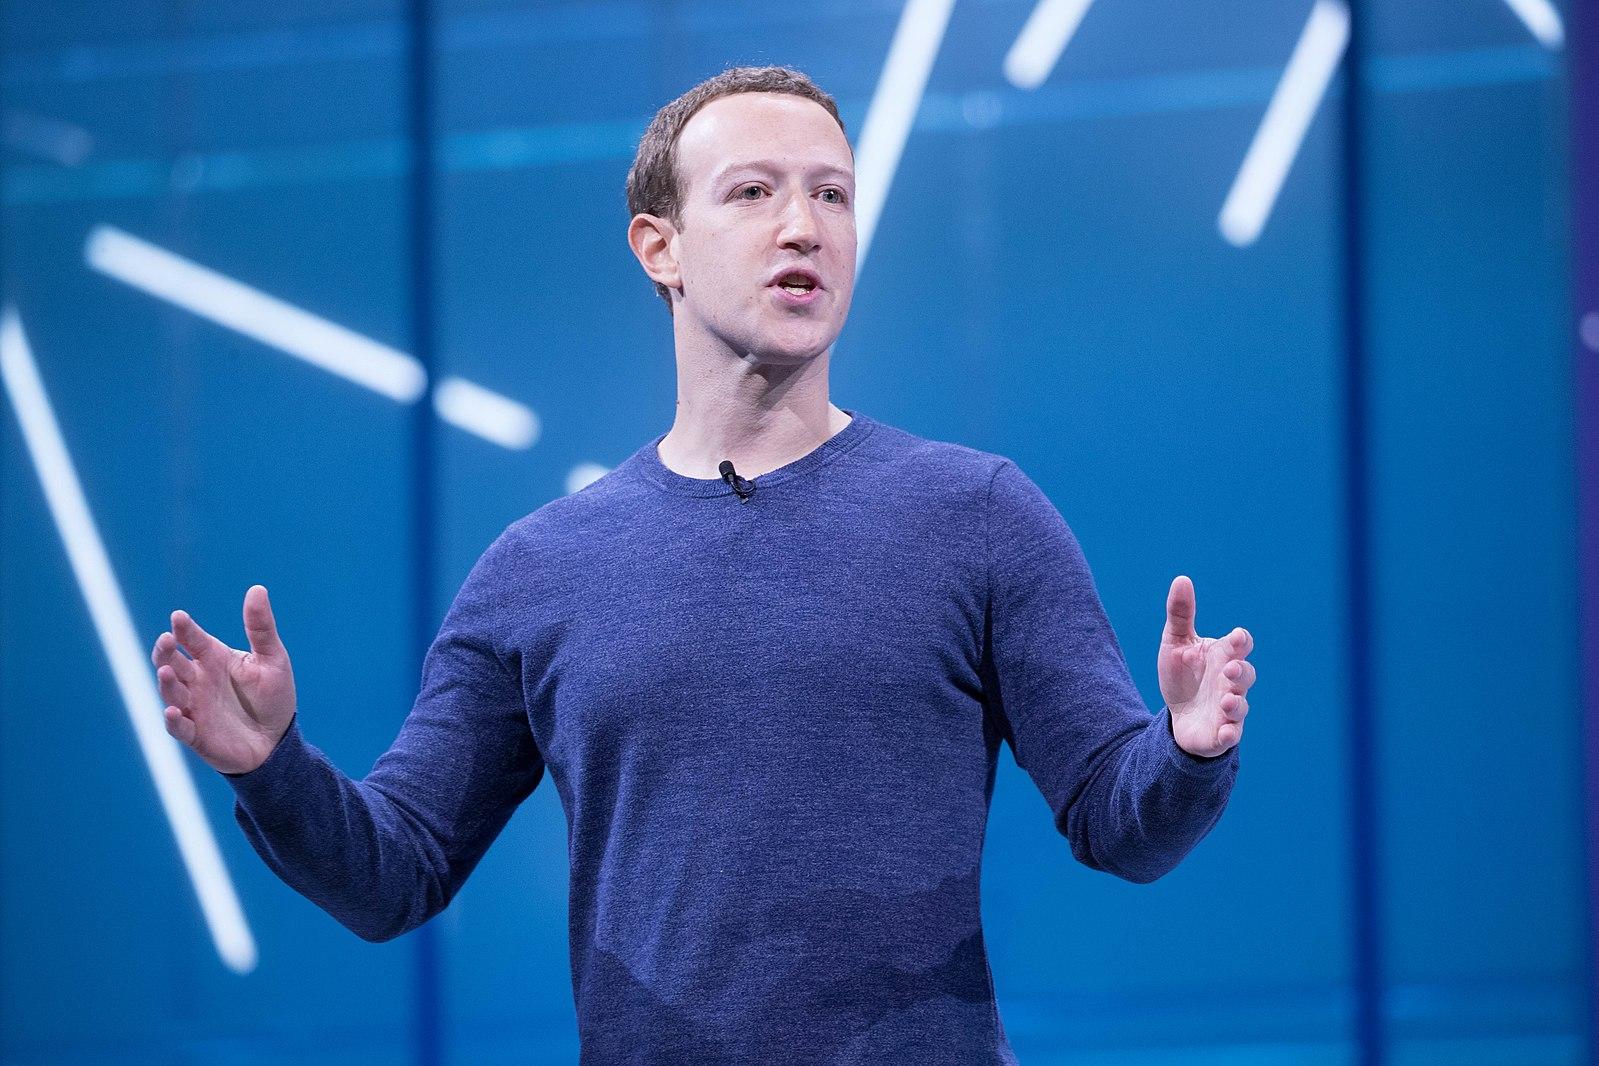 File:Mark Zuckerberg F8 2018 Keynote.jpg